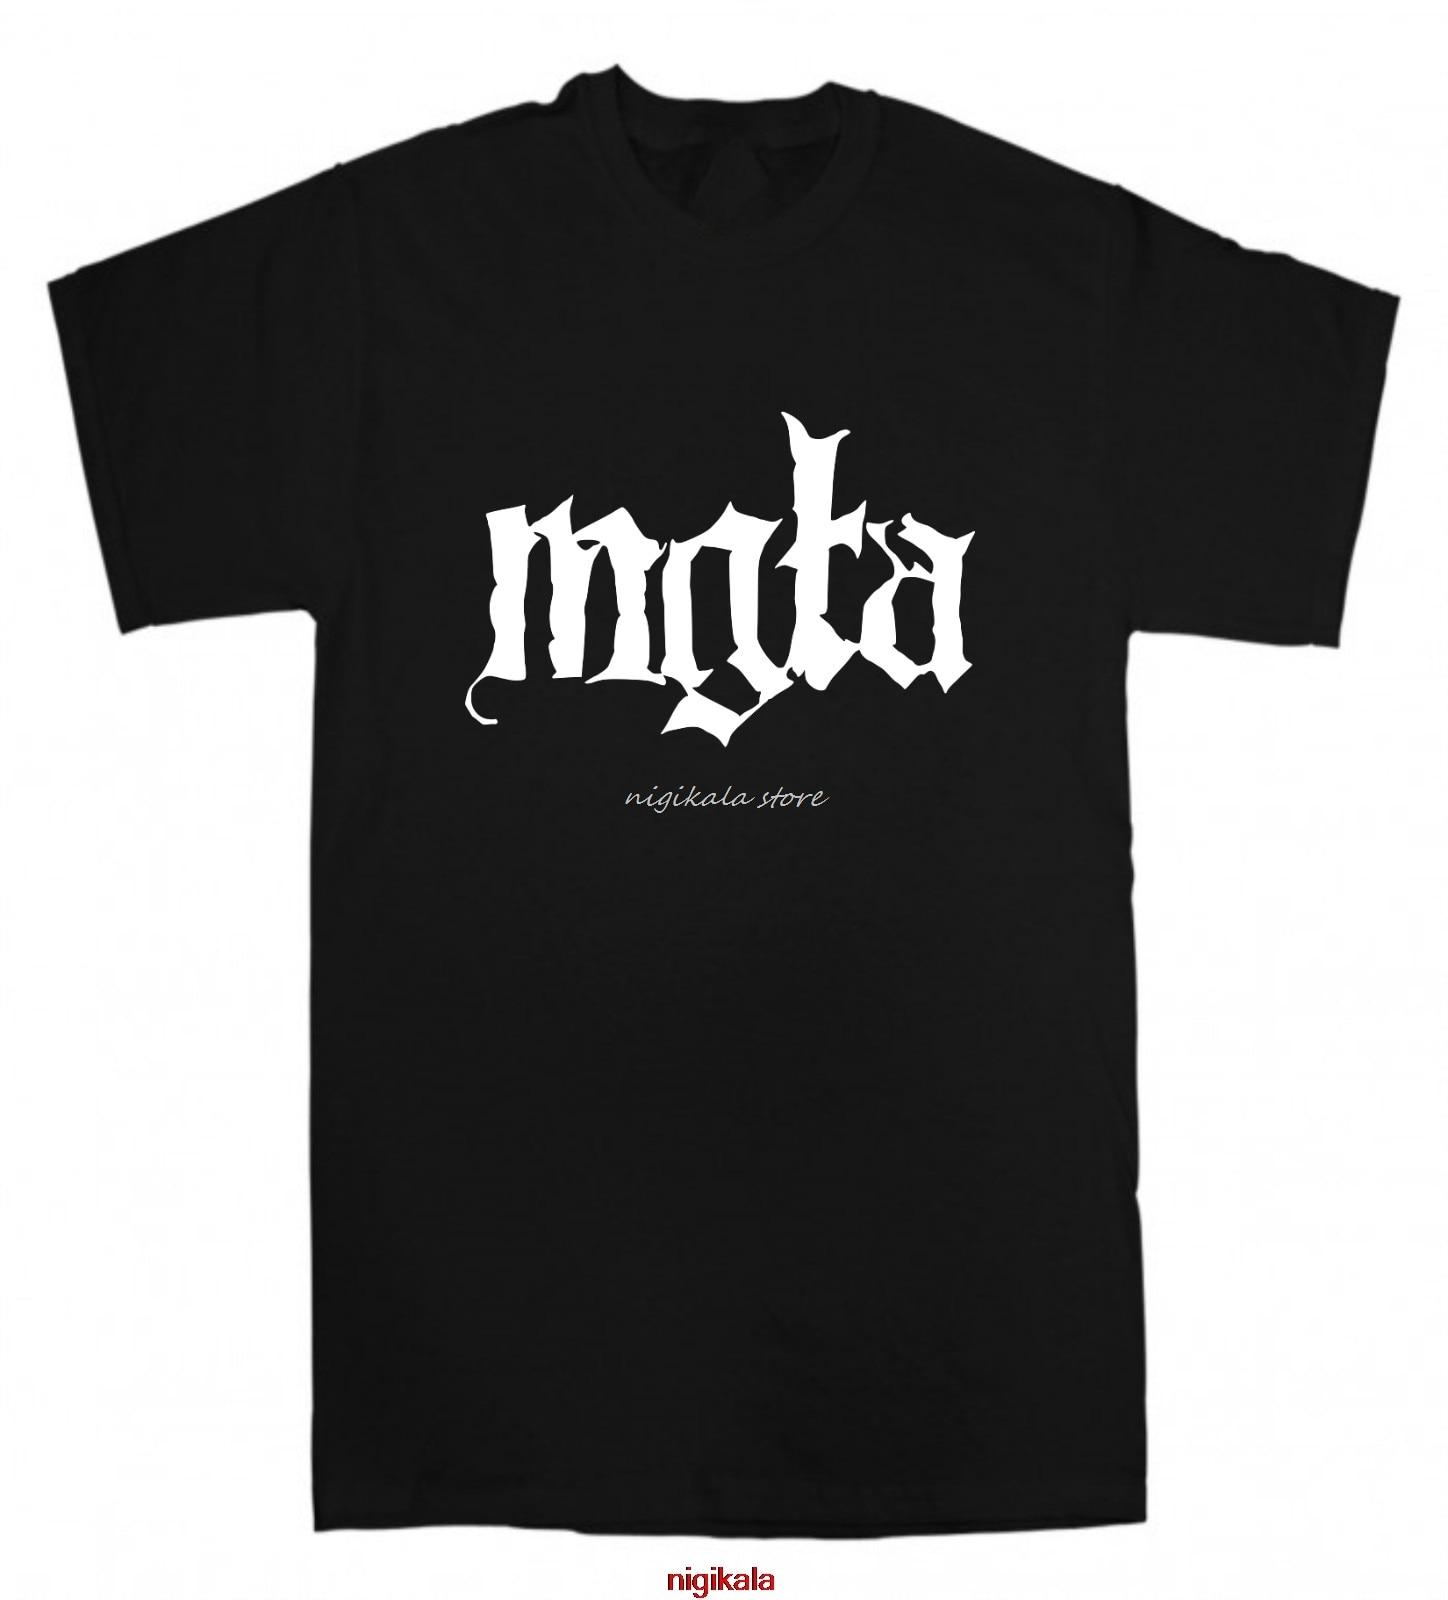 New ABSU Metal Rock Band Logo Short Sleeve Black Men/'s T-Shirt Size S-5XL